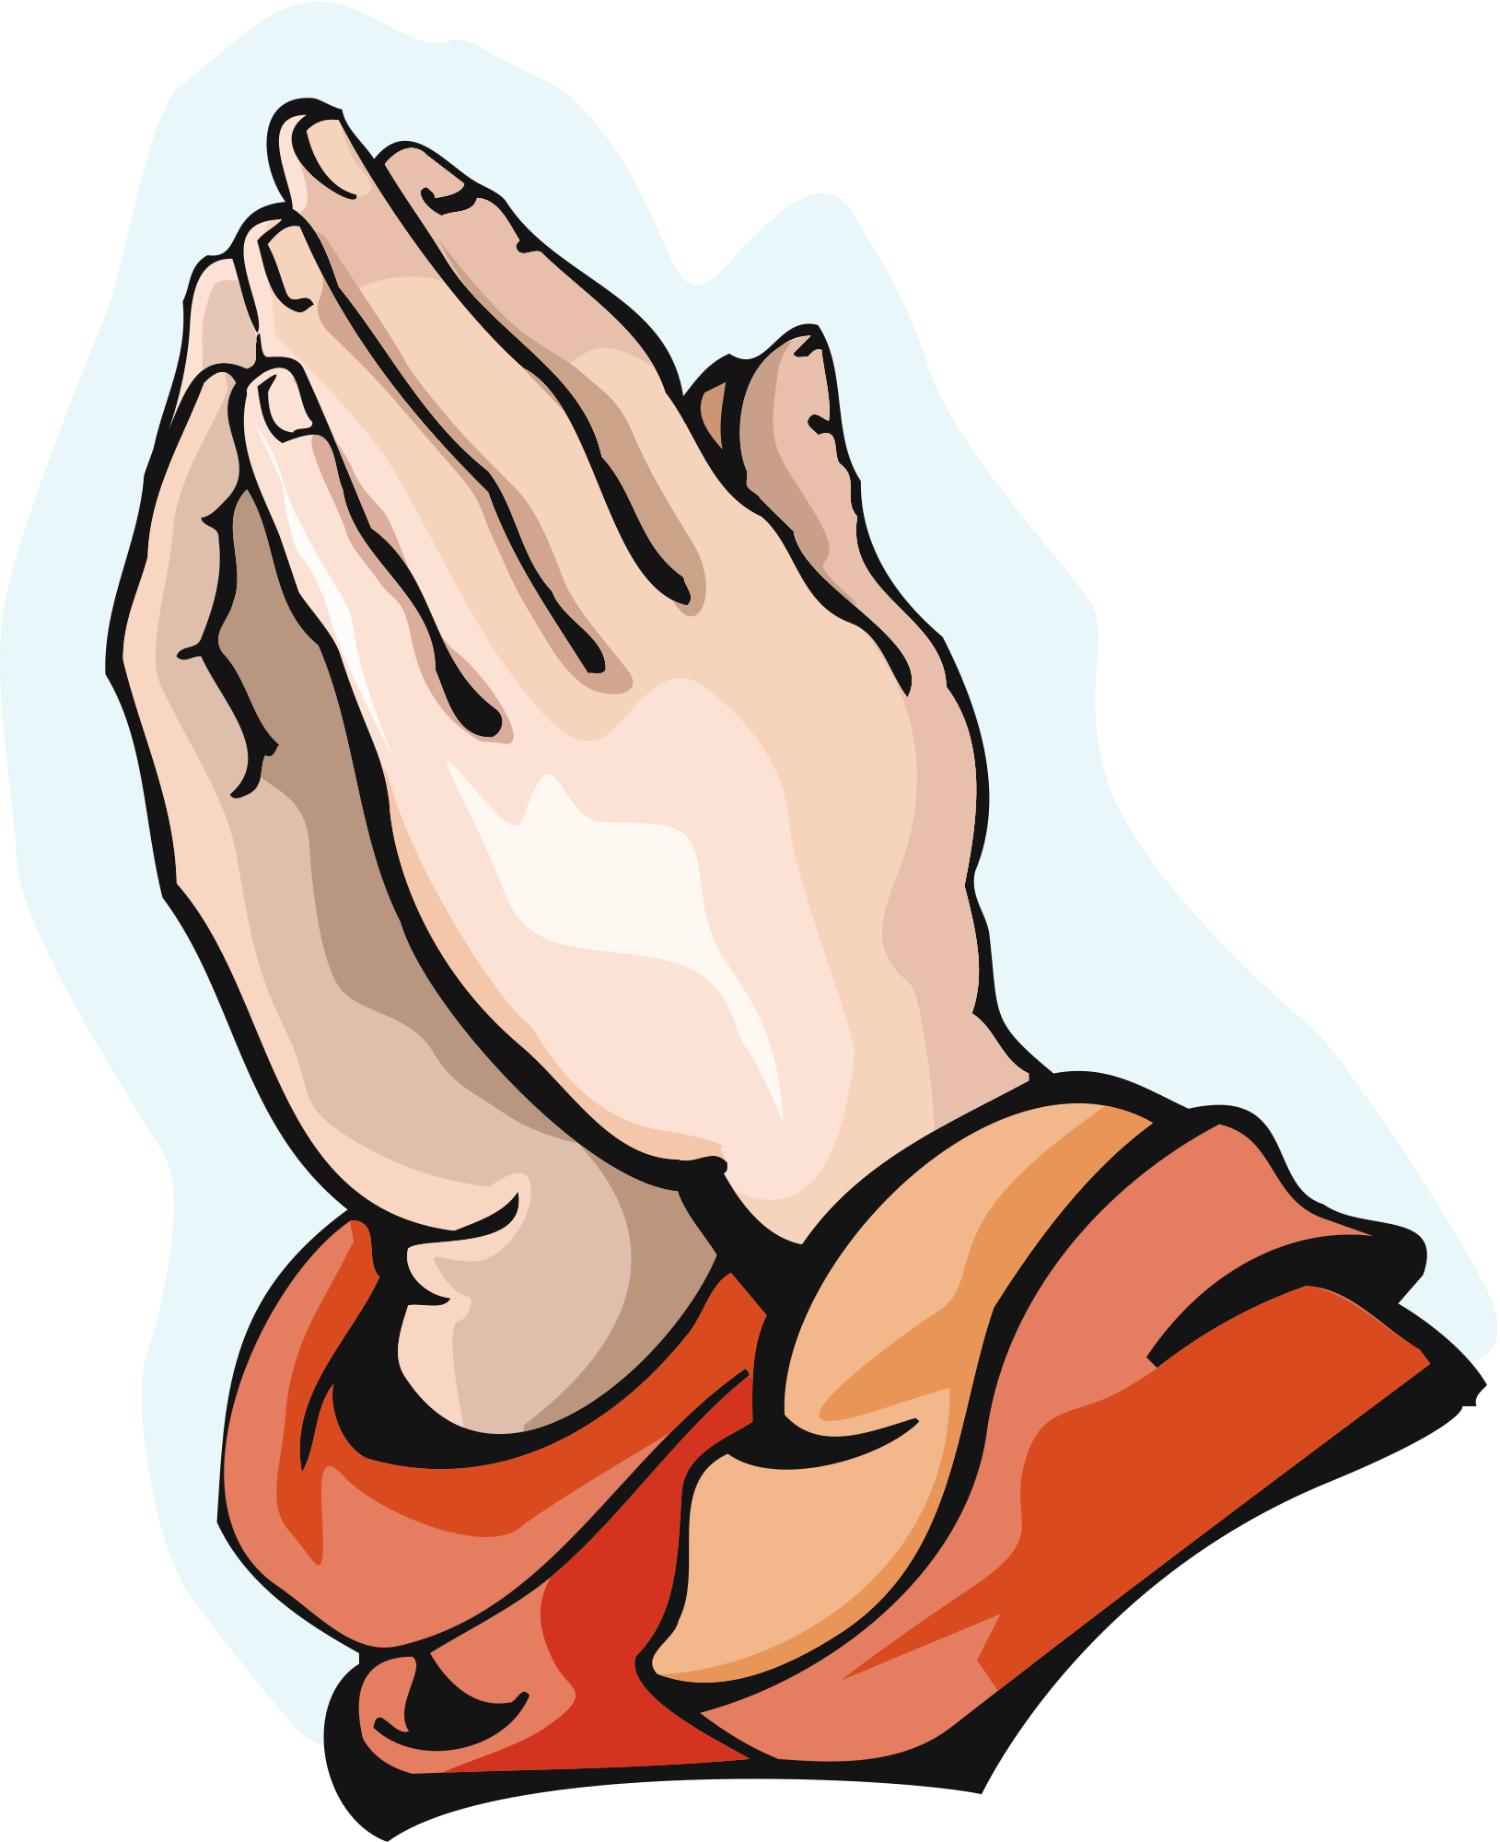 hight resolution of praying hand child prayer hands clip art image